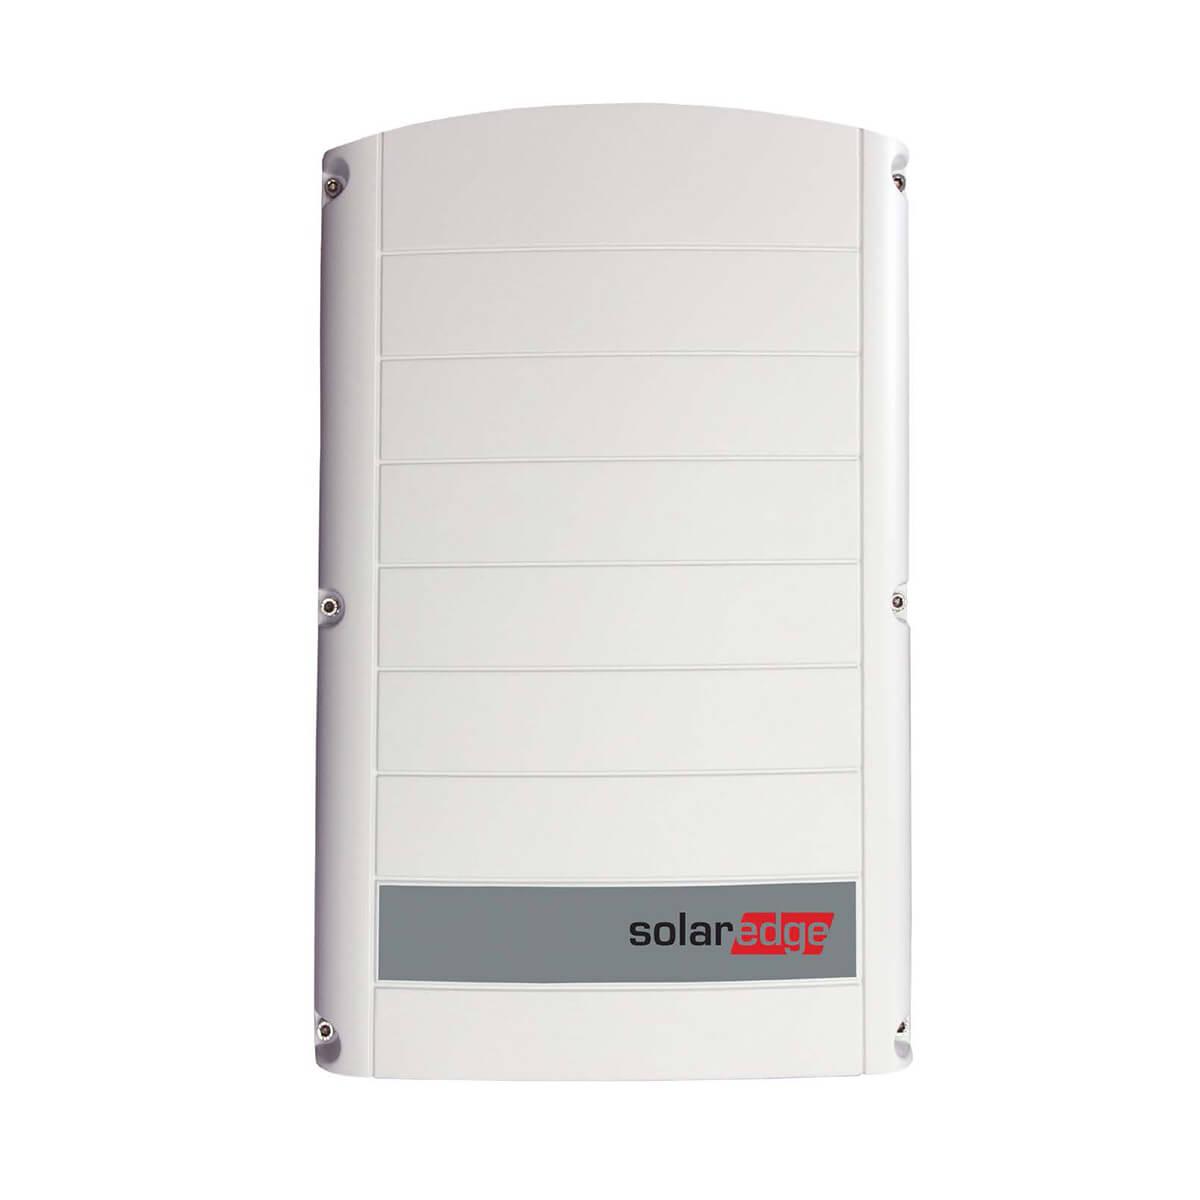 solaredge 33kW inverter, solaredge se33k 33kW inverter, solaredge se33k inverter, solaredge se33k, solaredge 33 kW